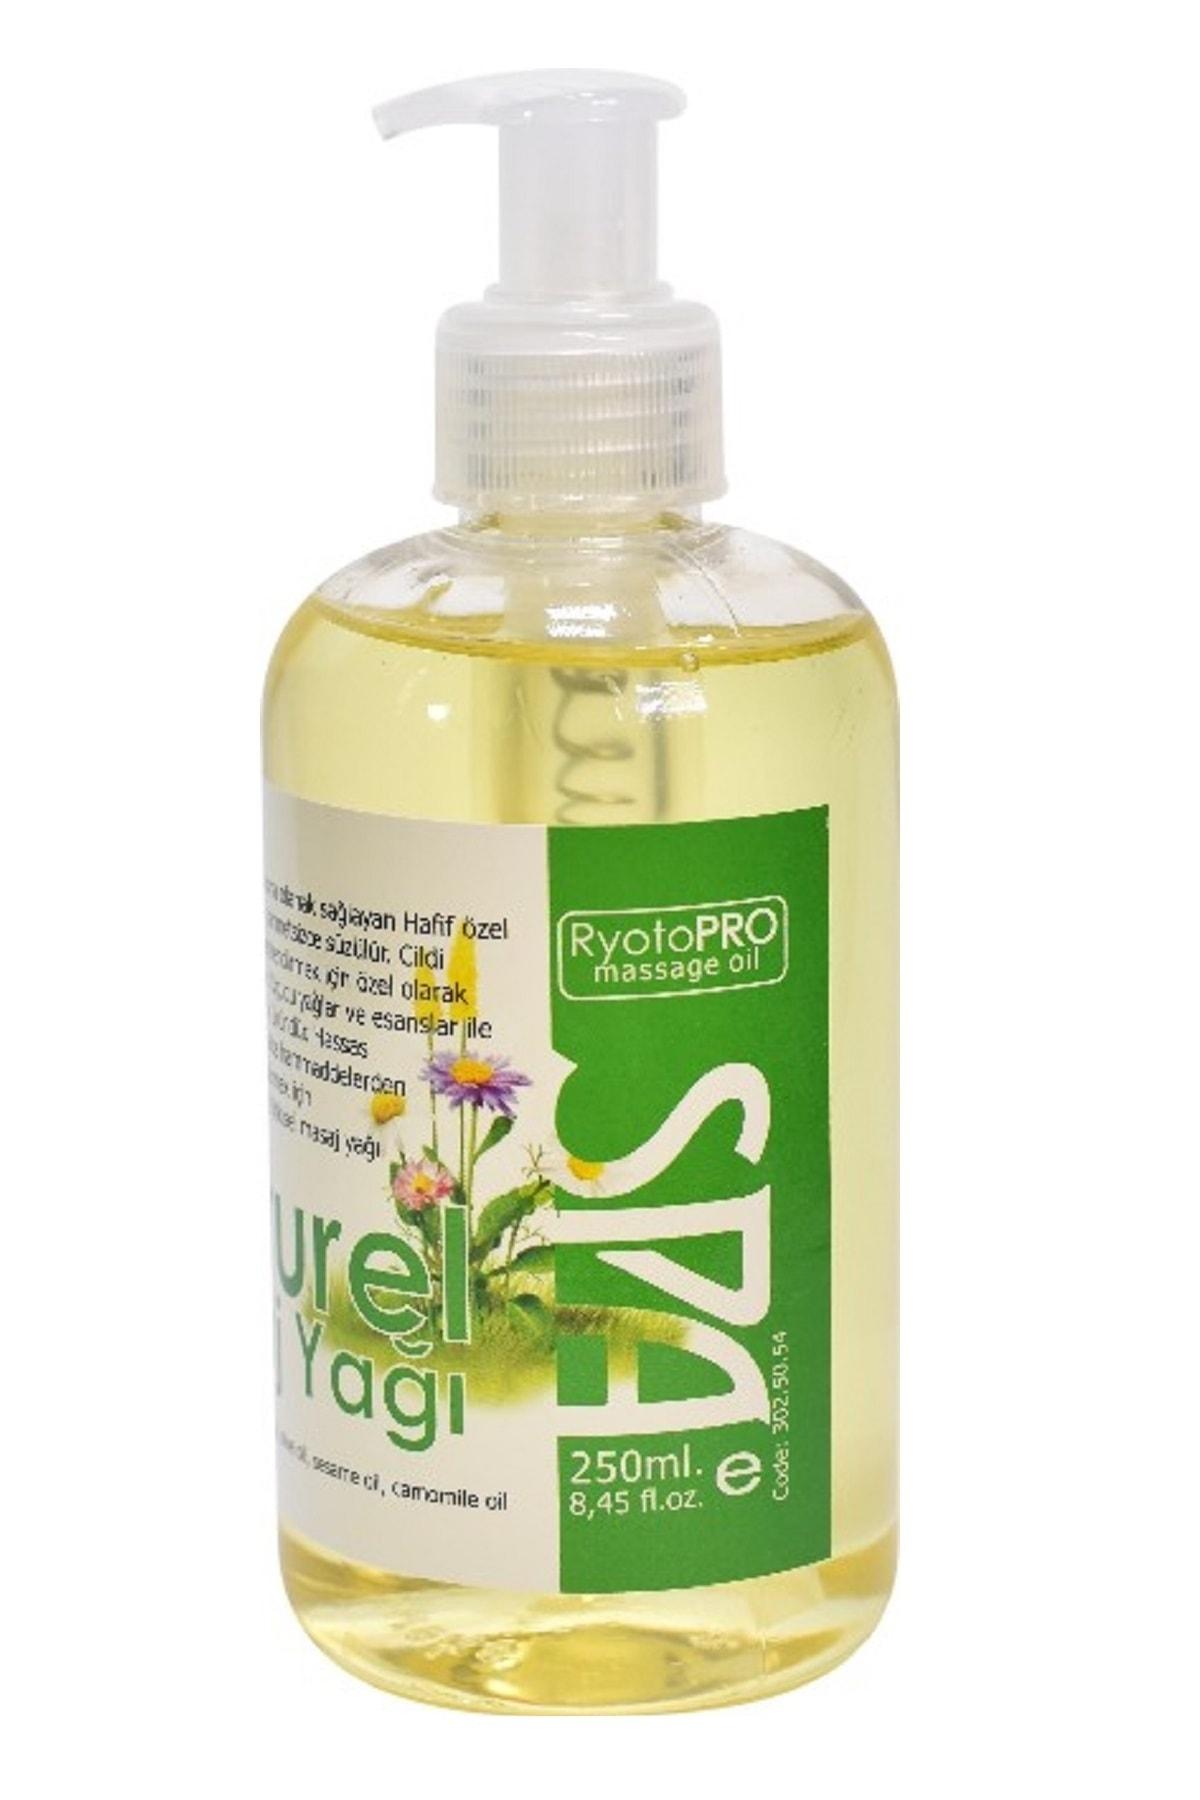 RyotoPRO Biberiye Aromaterapi Masaj Yağı 250 ml 1